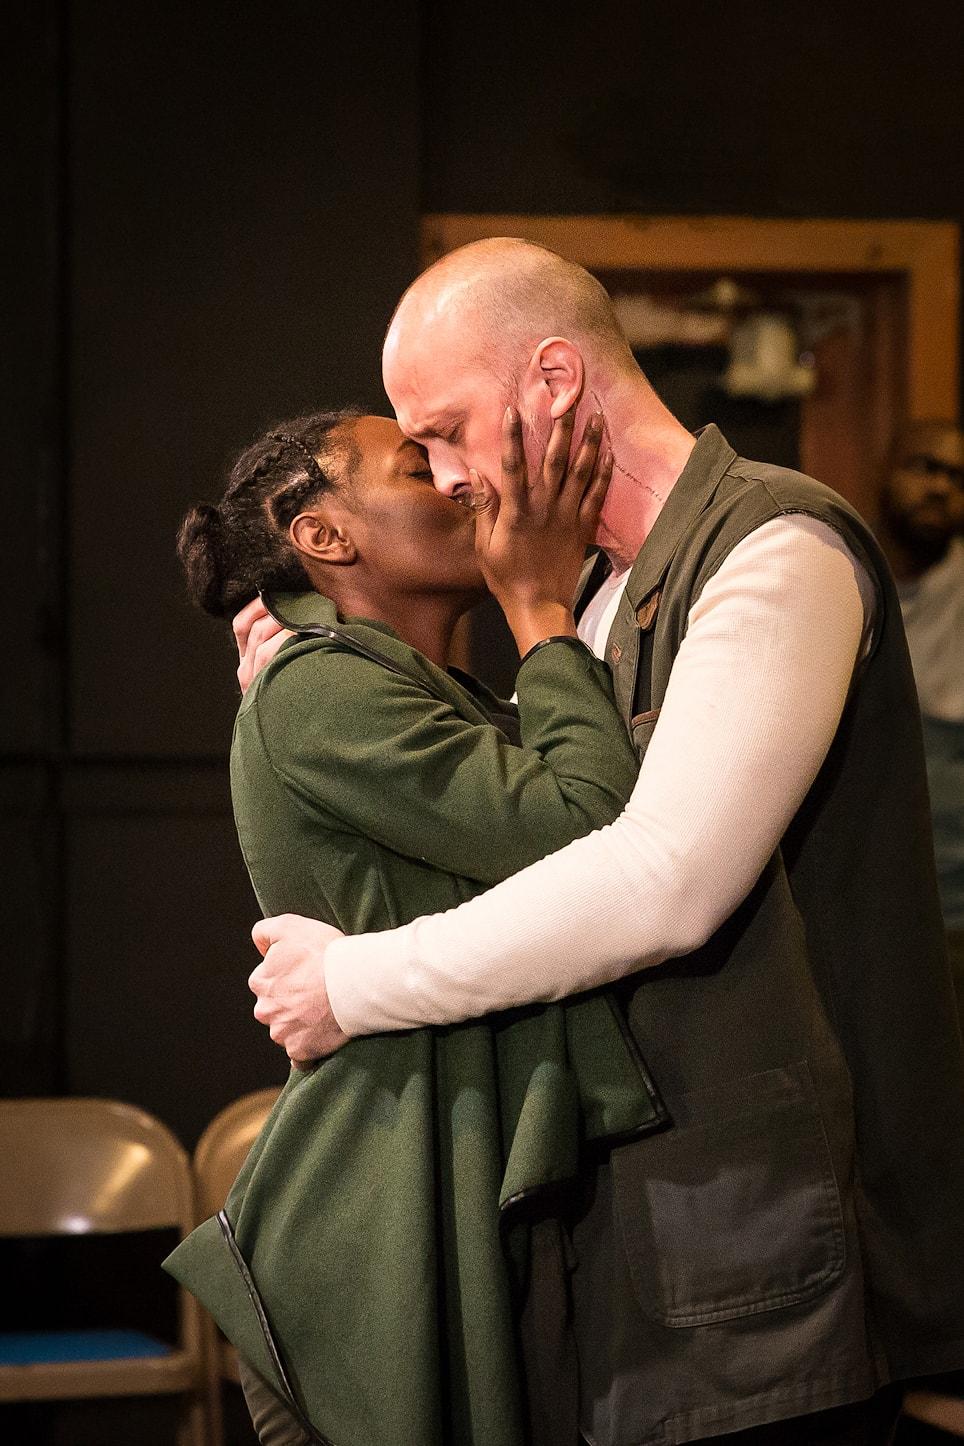 Renea S. Brown as Virgilia and John Stange as Coriolanus. Photo by Claire Kimball.